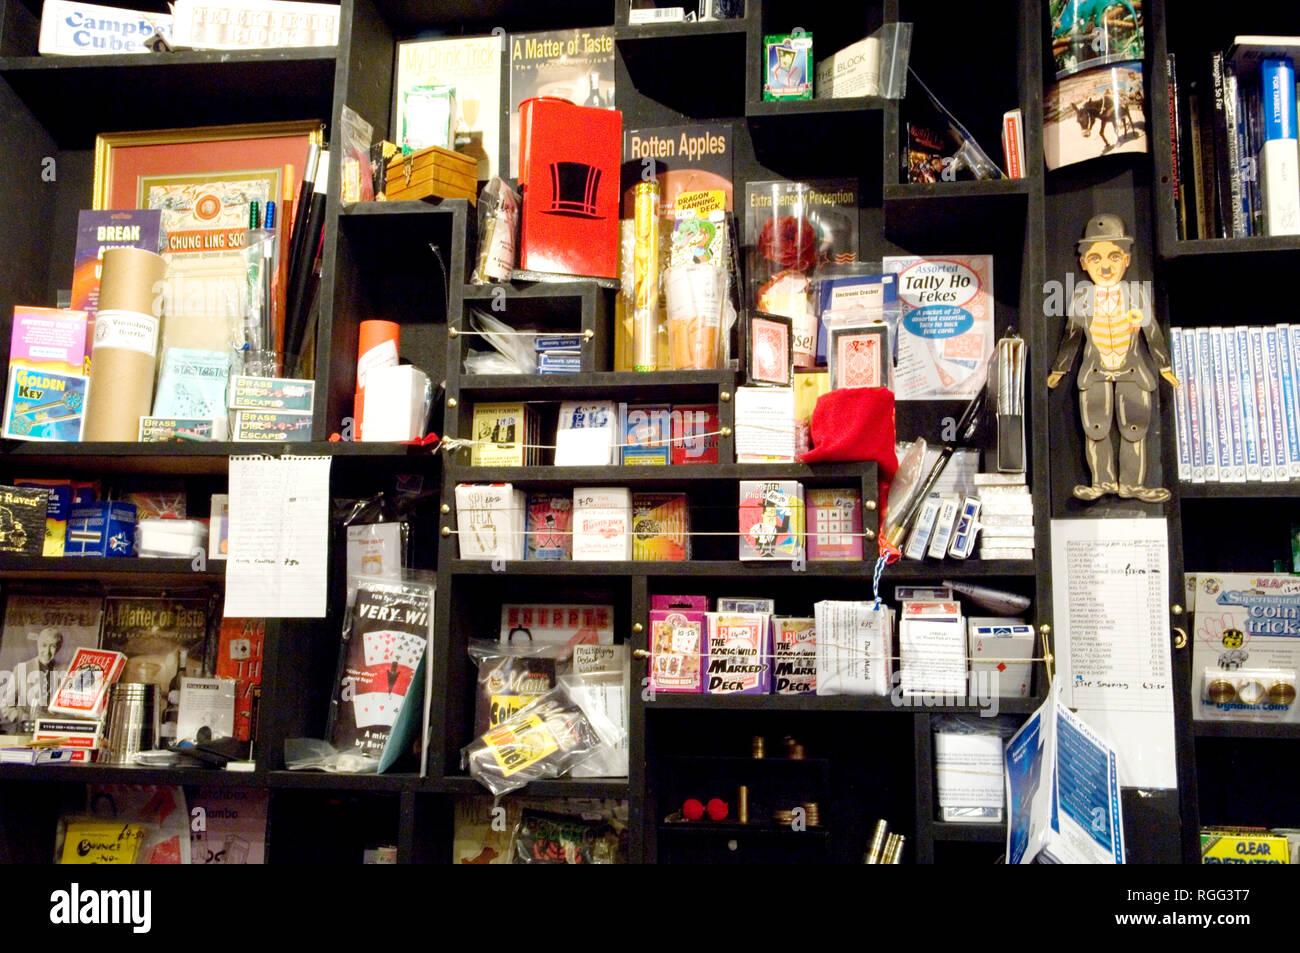 Tricks for sale in International Magic, Clerkenwell Road, London. - Stock Image